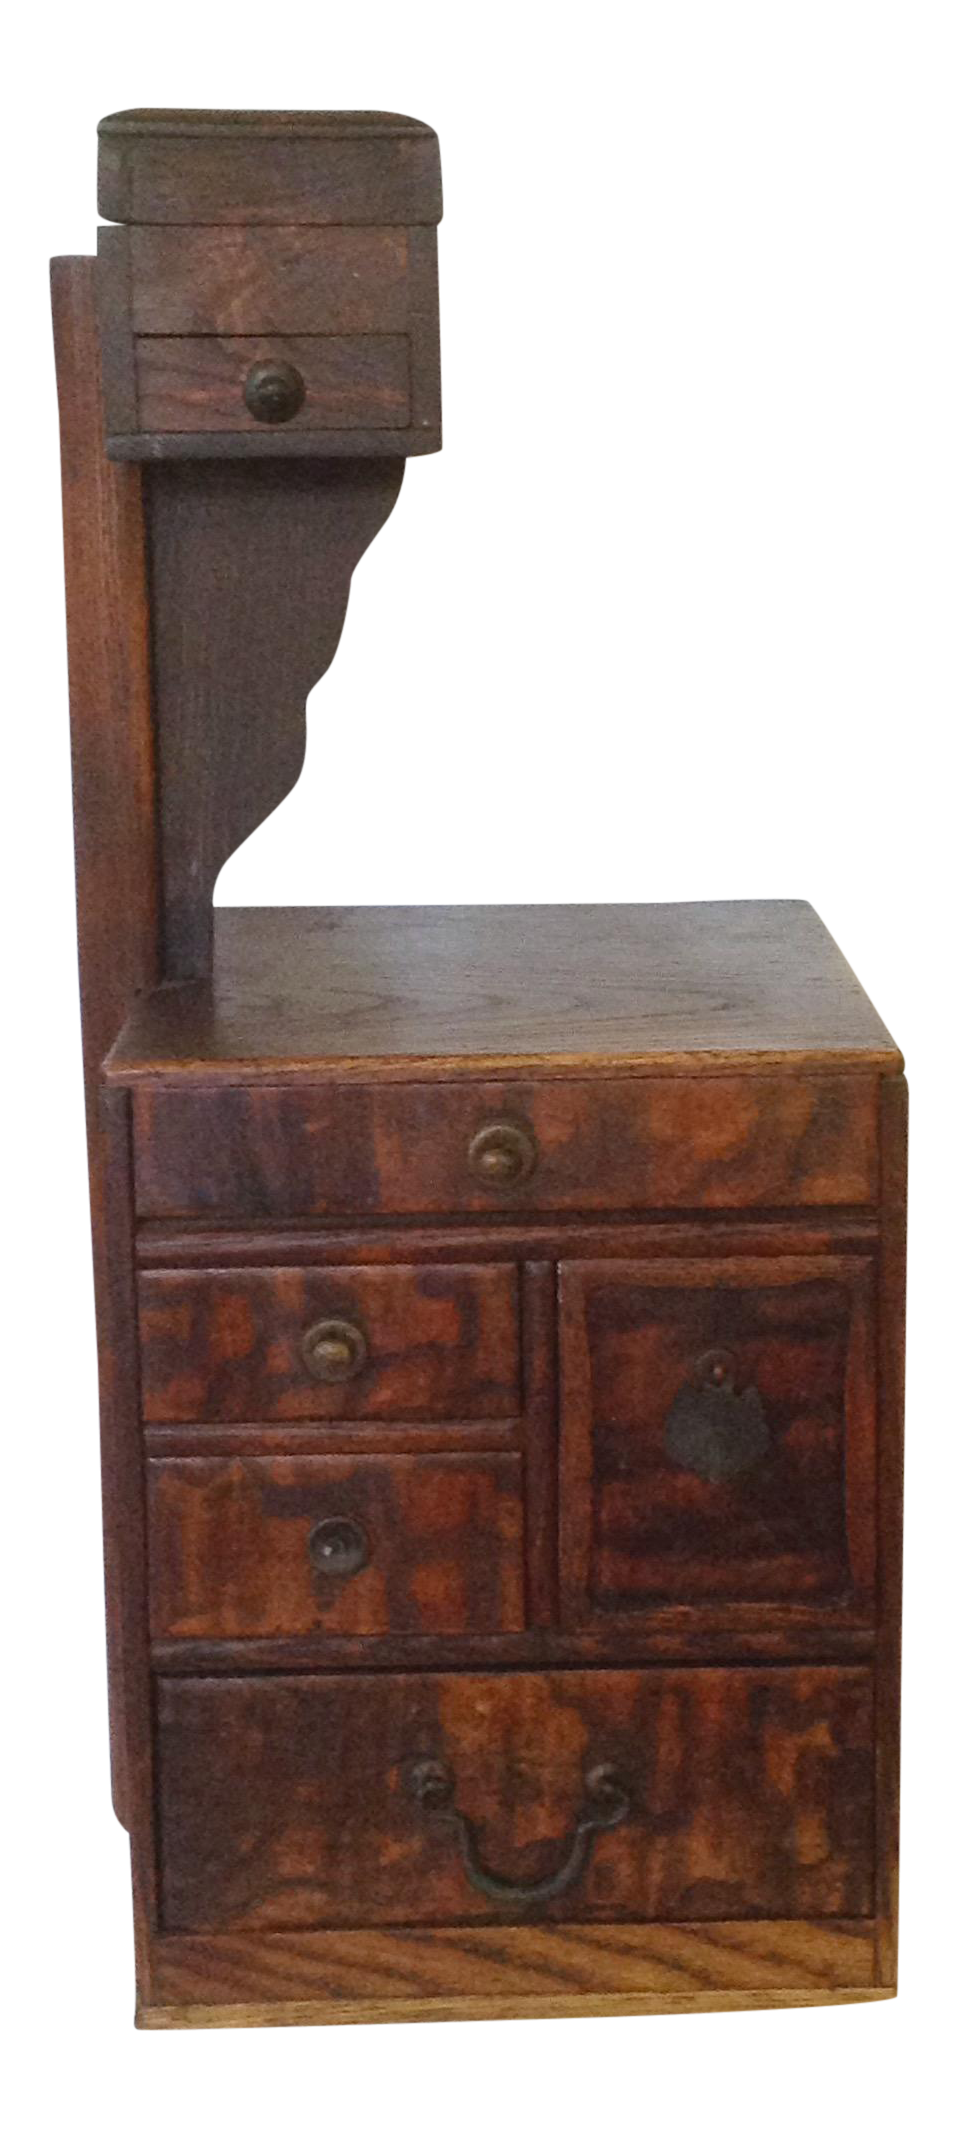 - Antique Japanese Sewing Box Chairish